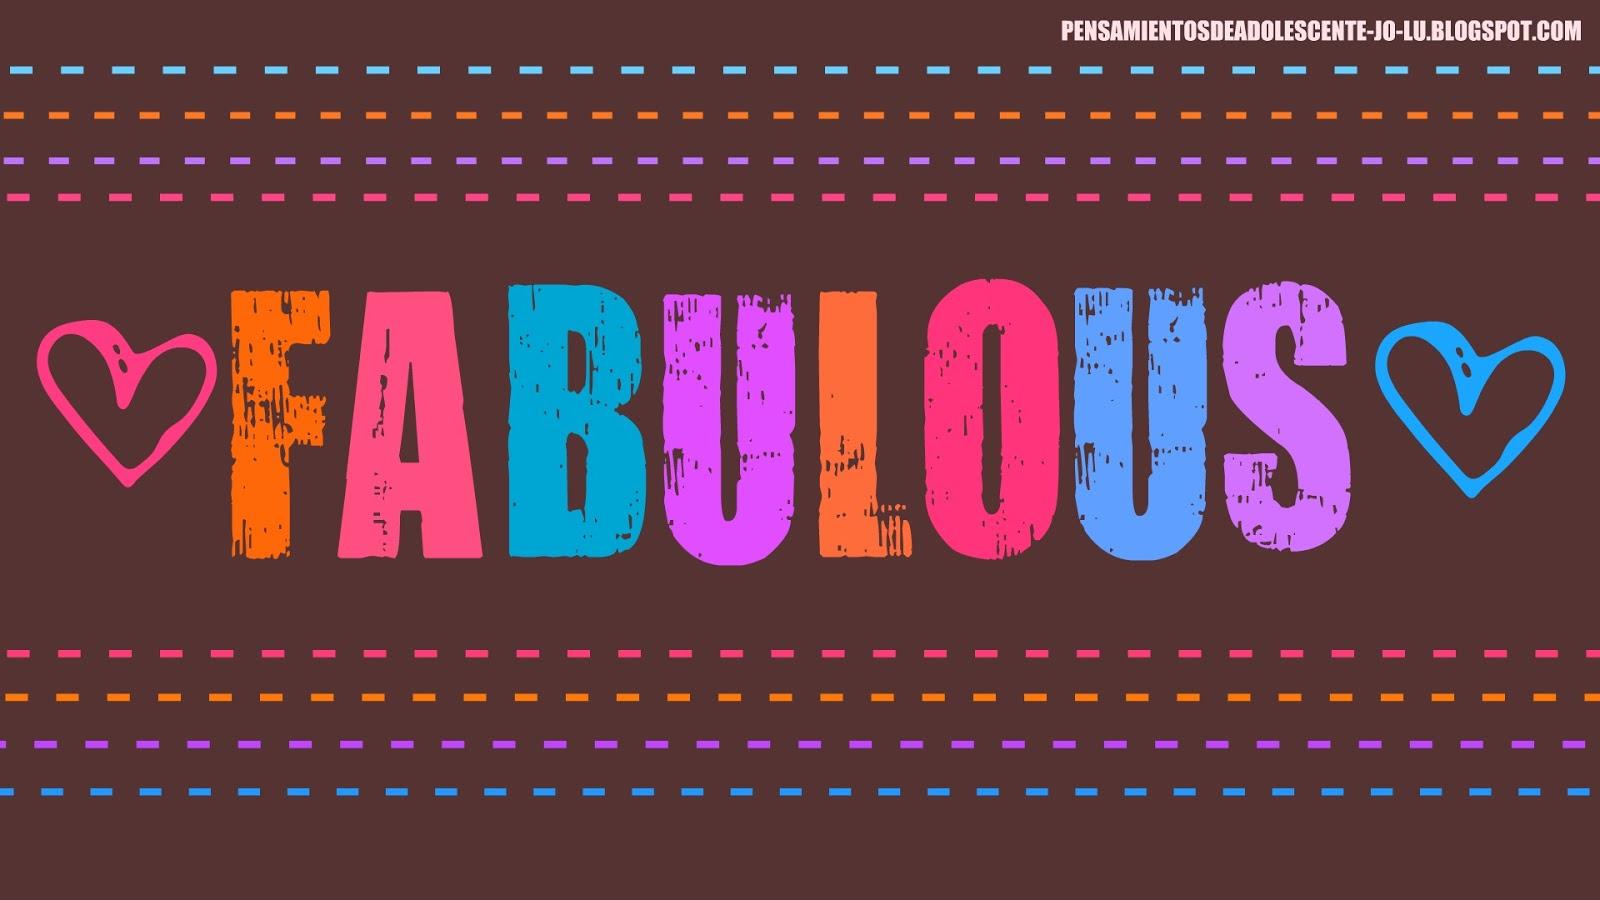 WALLPAPER FABULOUS 1600x900